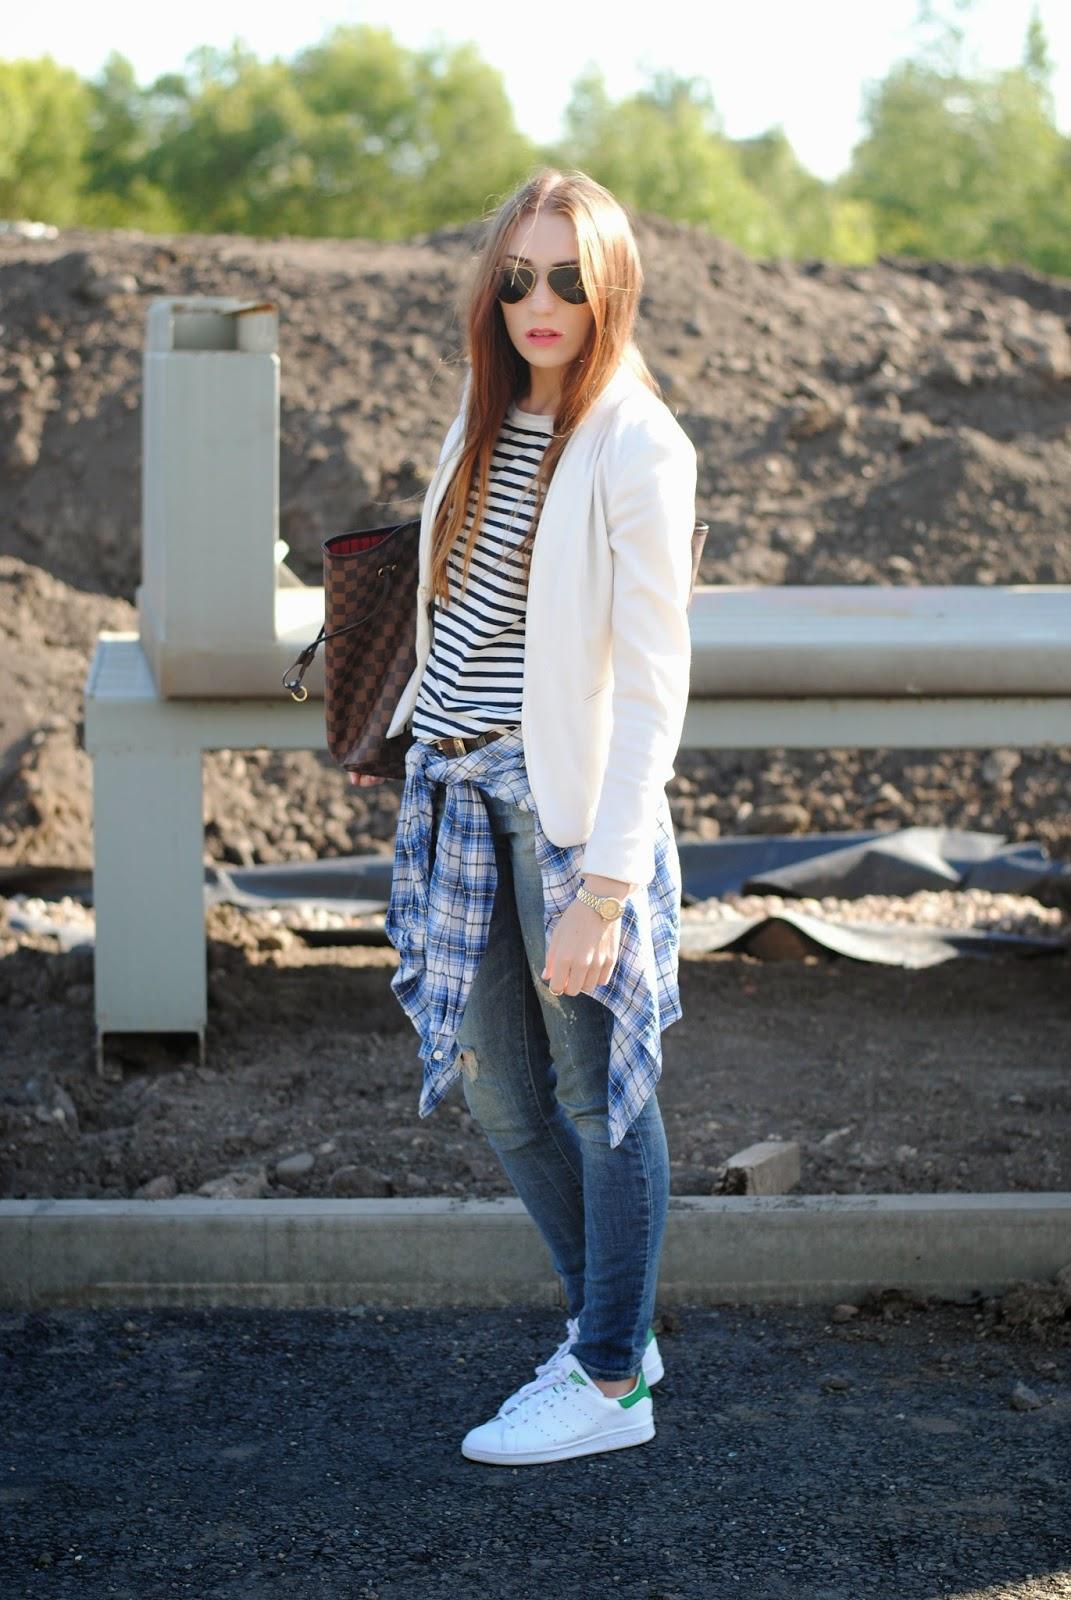 e109dde4041f Blazer – H M   Breton strip top – Cos   Jeans – Zara   Belt – Vintage  Armani   Bag – Louis Vuitton Neverfull   Trainers – Adidas Stan Smith    Shirt – old ...